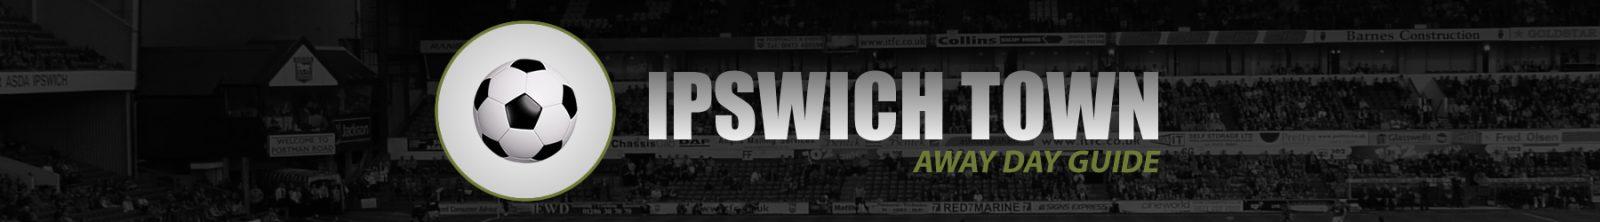 Ipswich Town Away